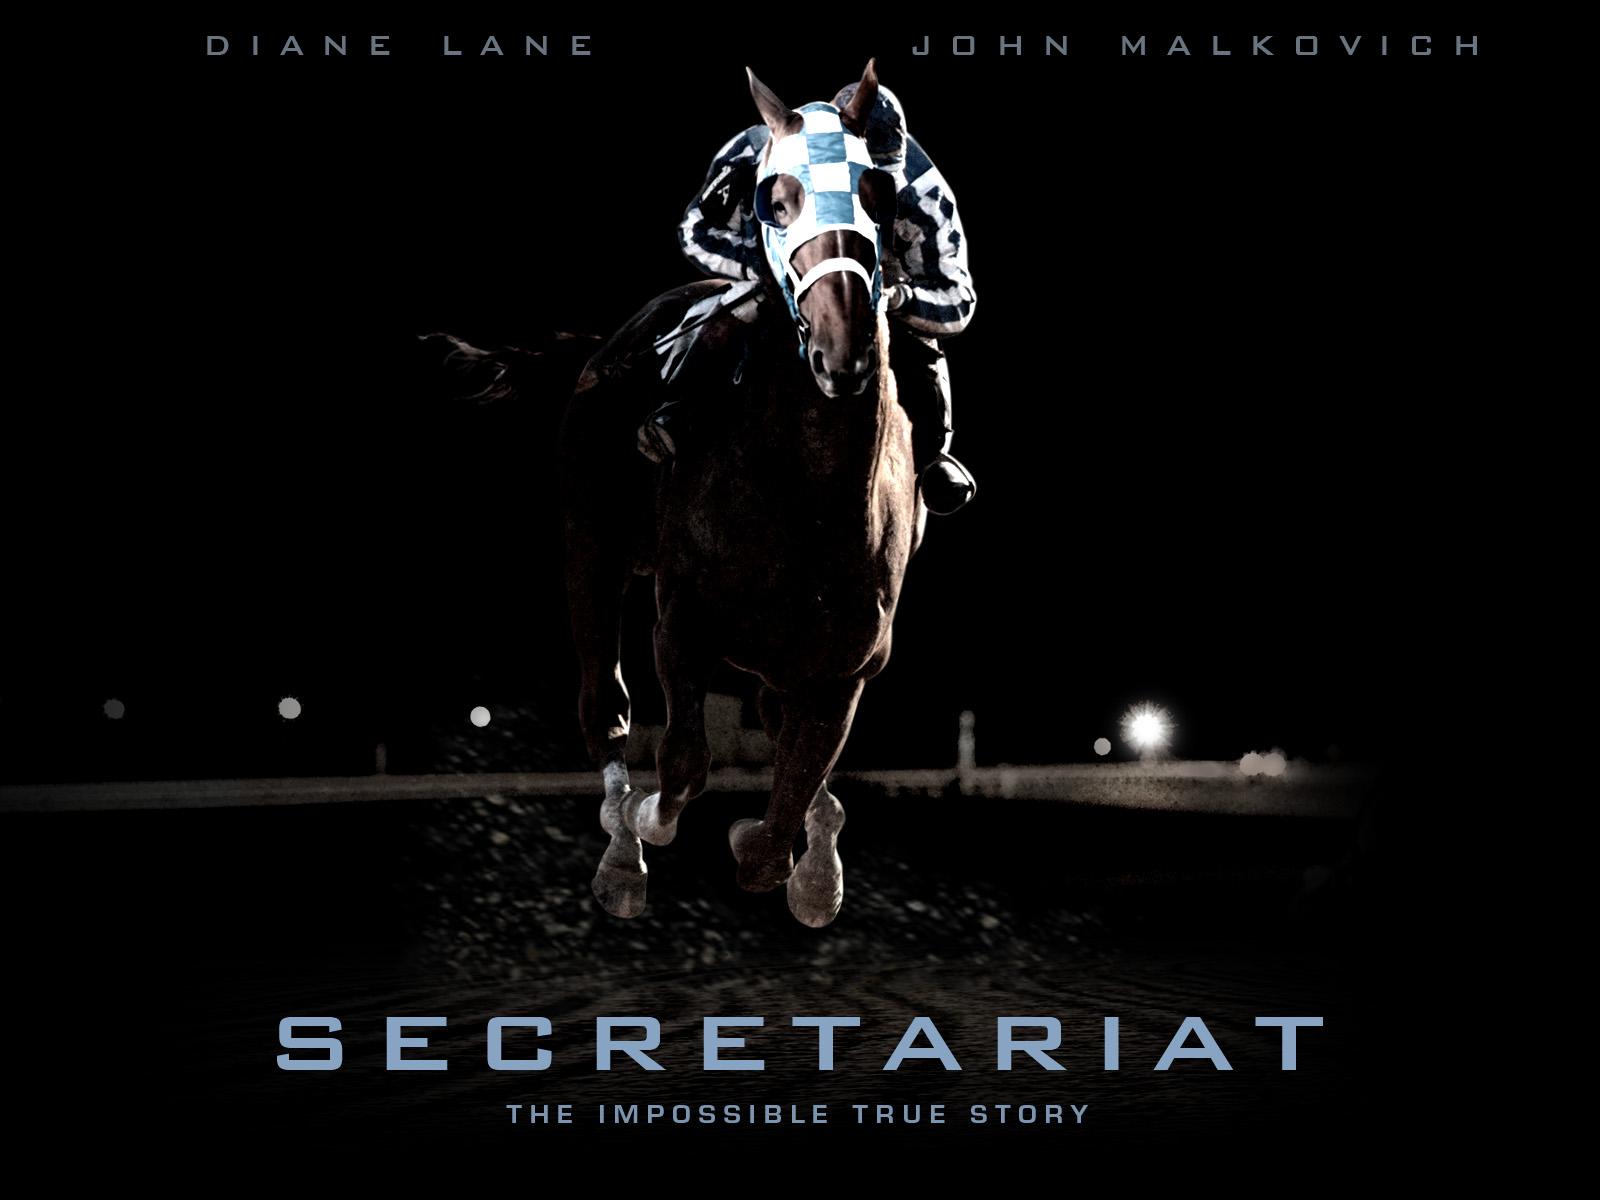 secretariat wallpaper -#main